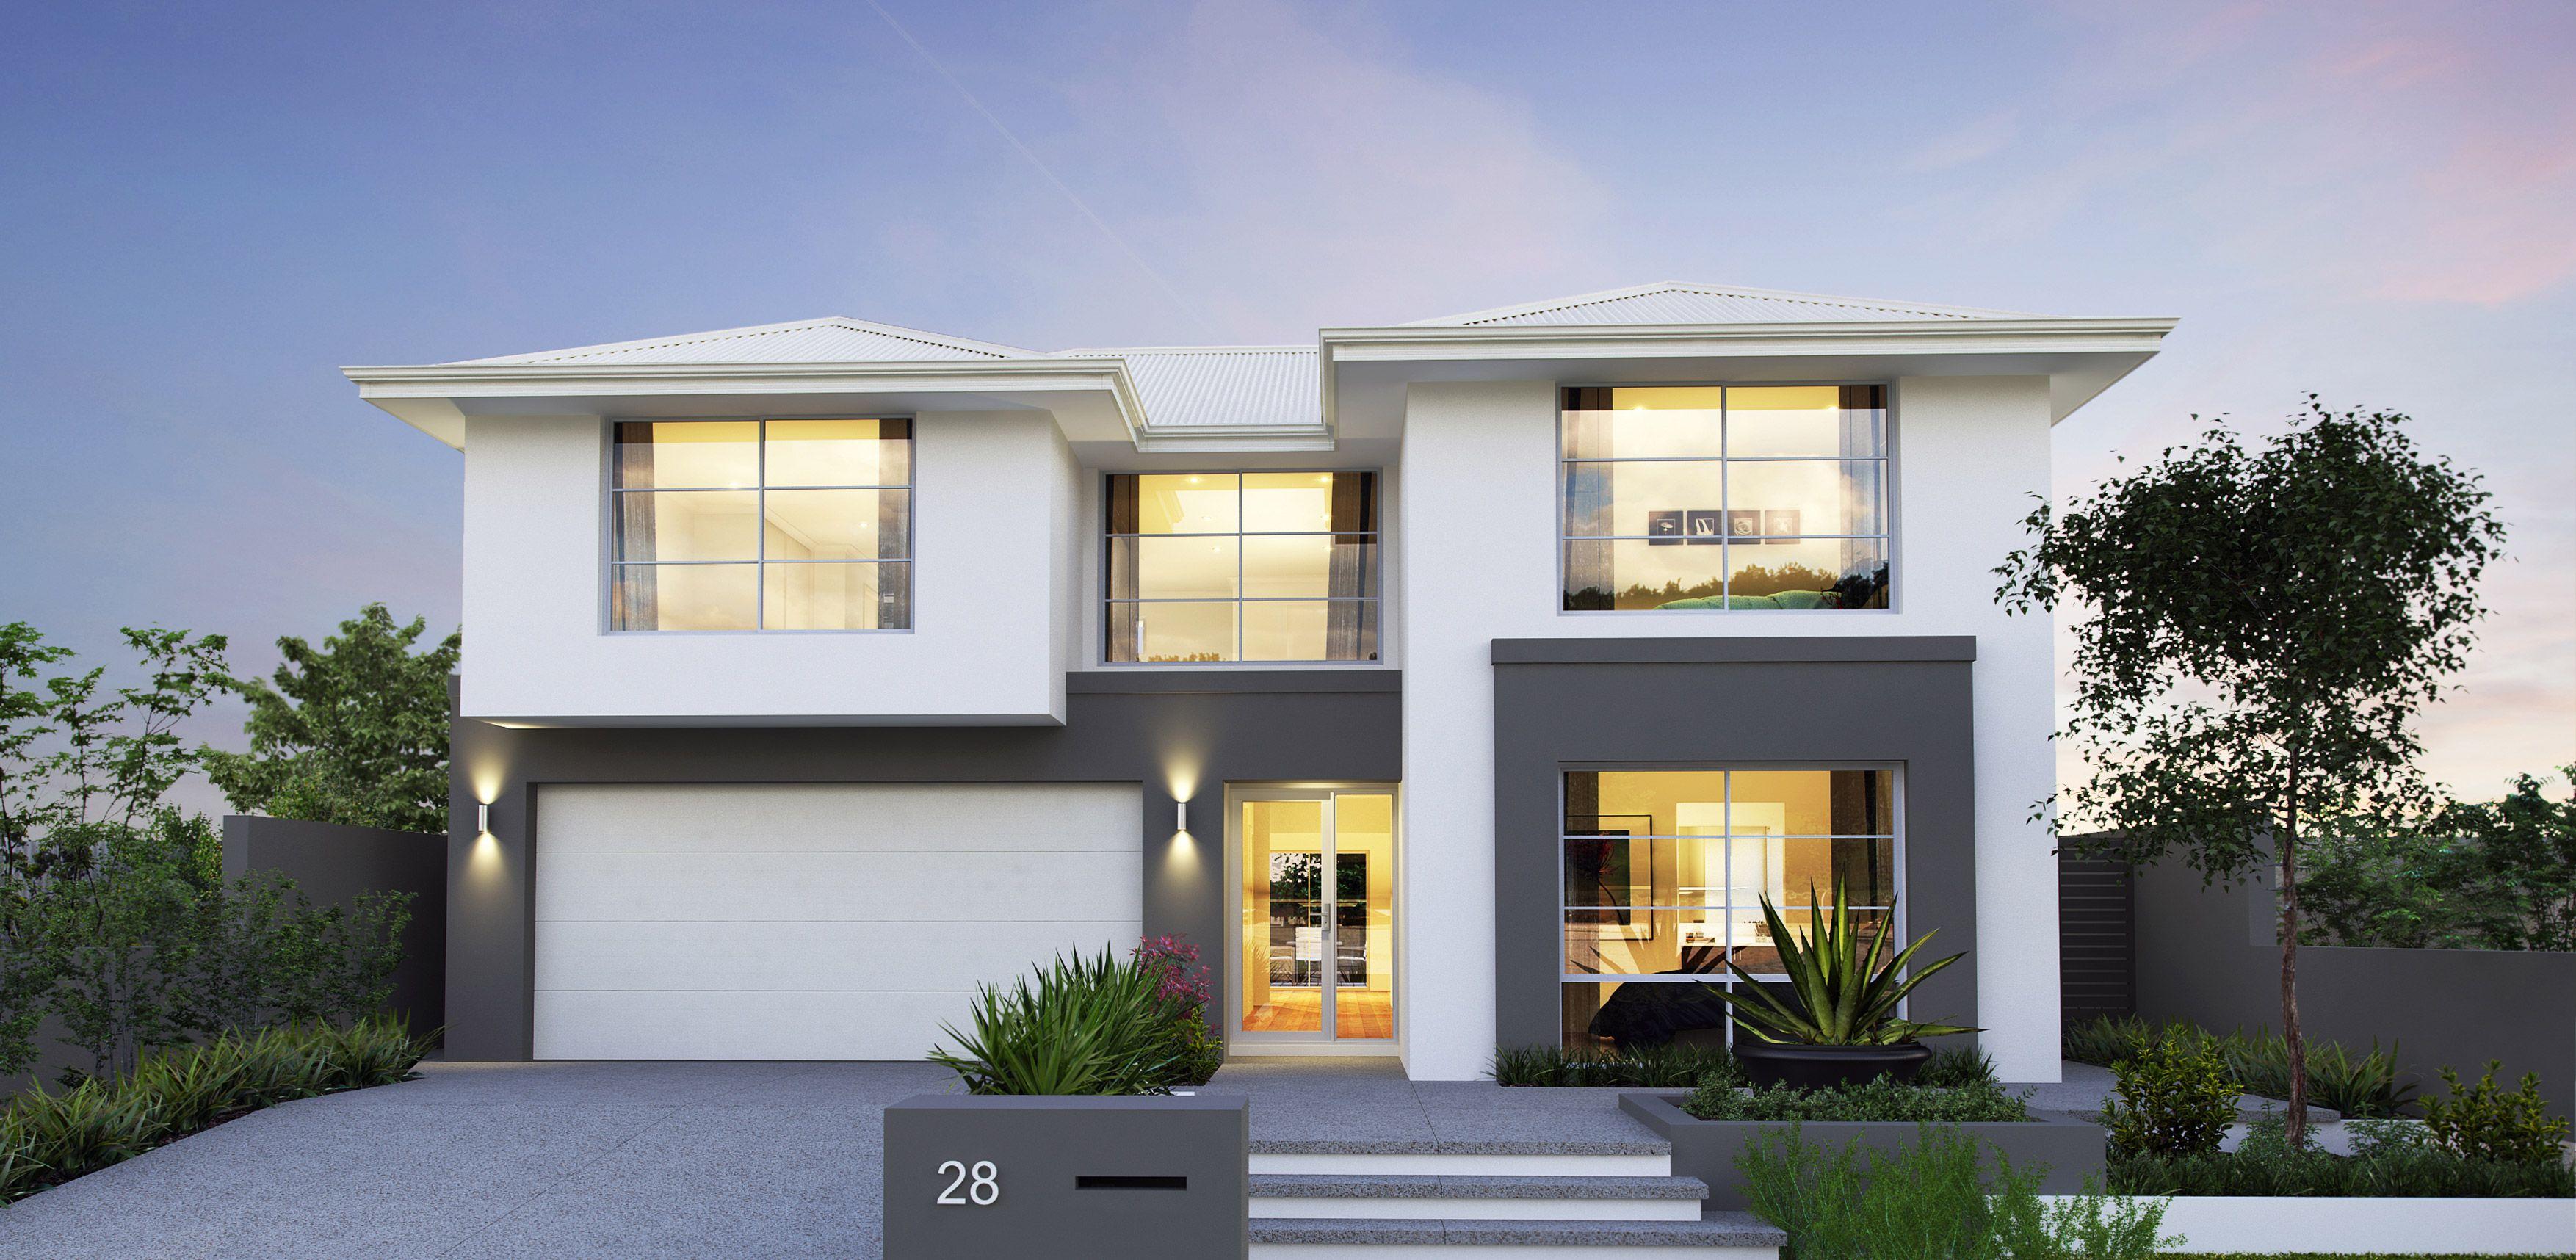 Two Storey Home Design Perth